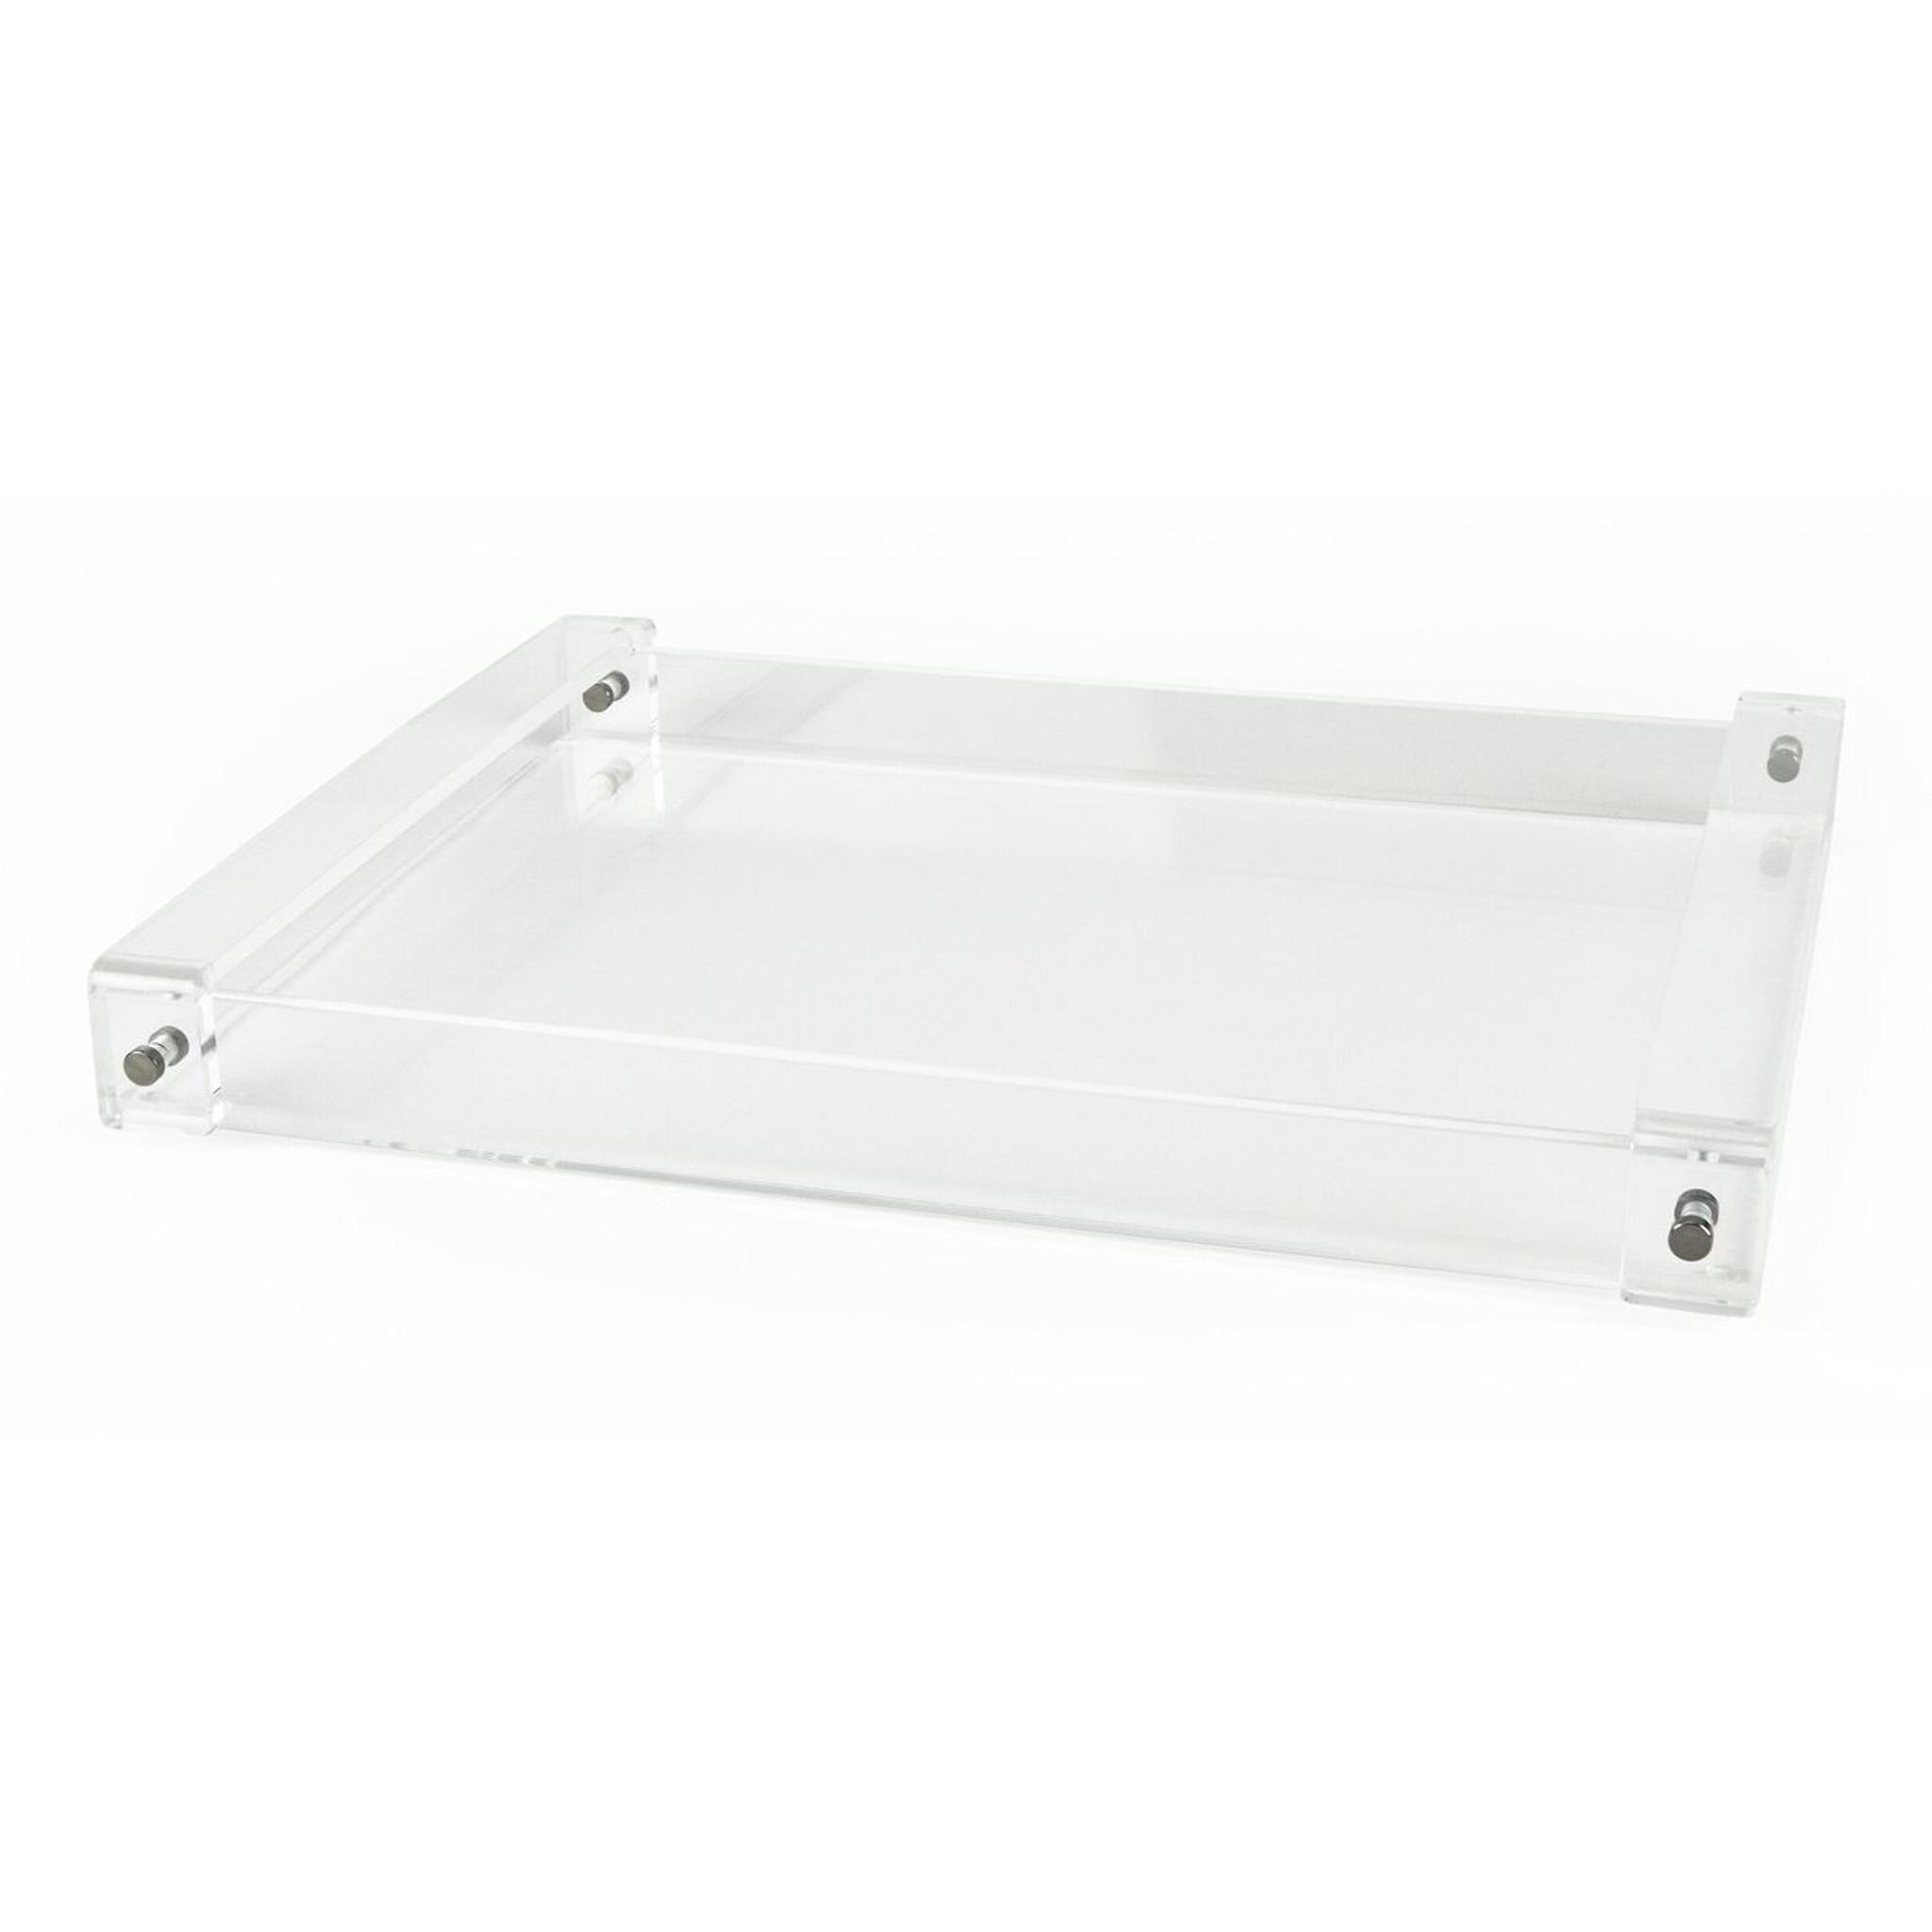 tizo acrylic serving tray with handles large decorative ottoman tray modern